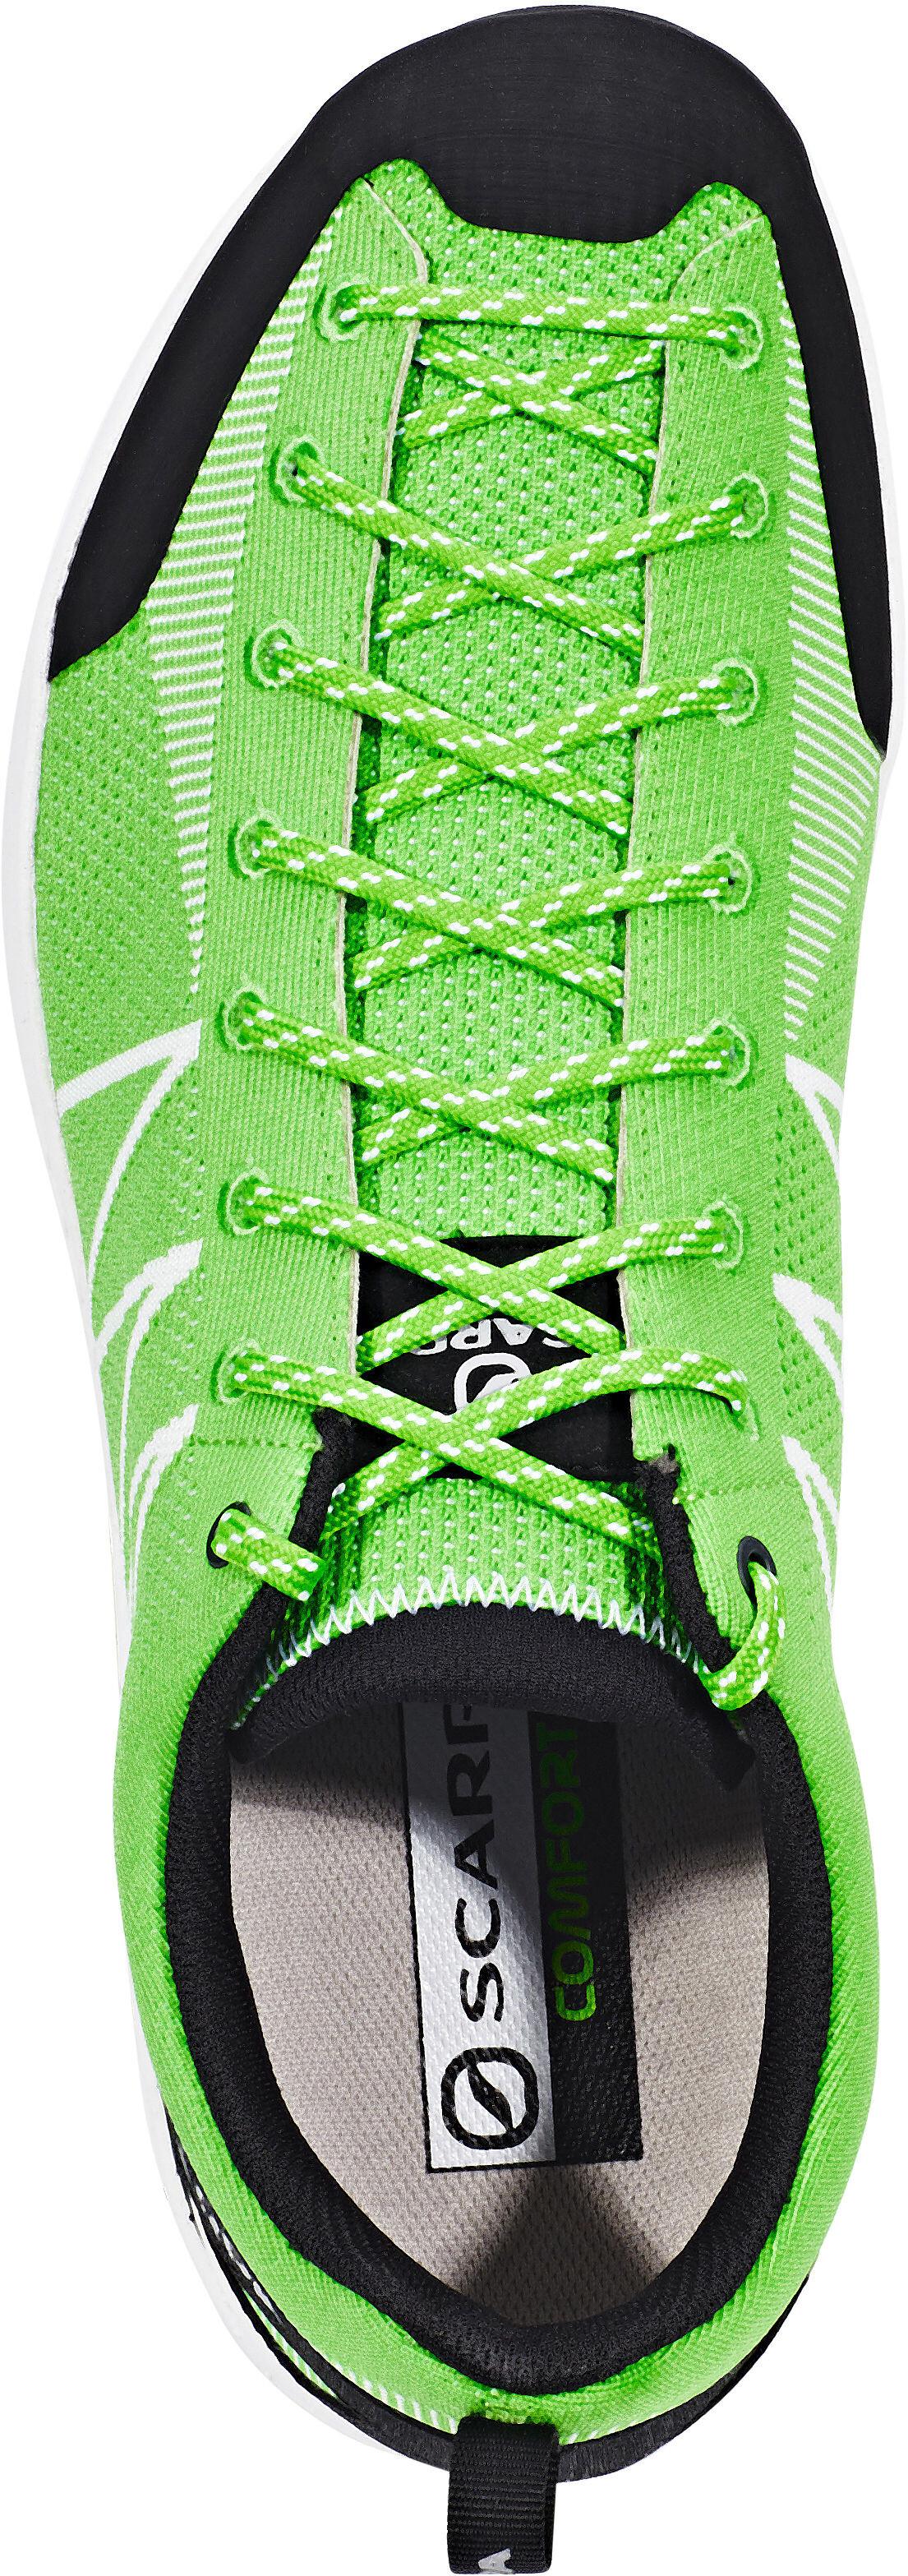 Scarpa Iguana Approach Shoe Review